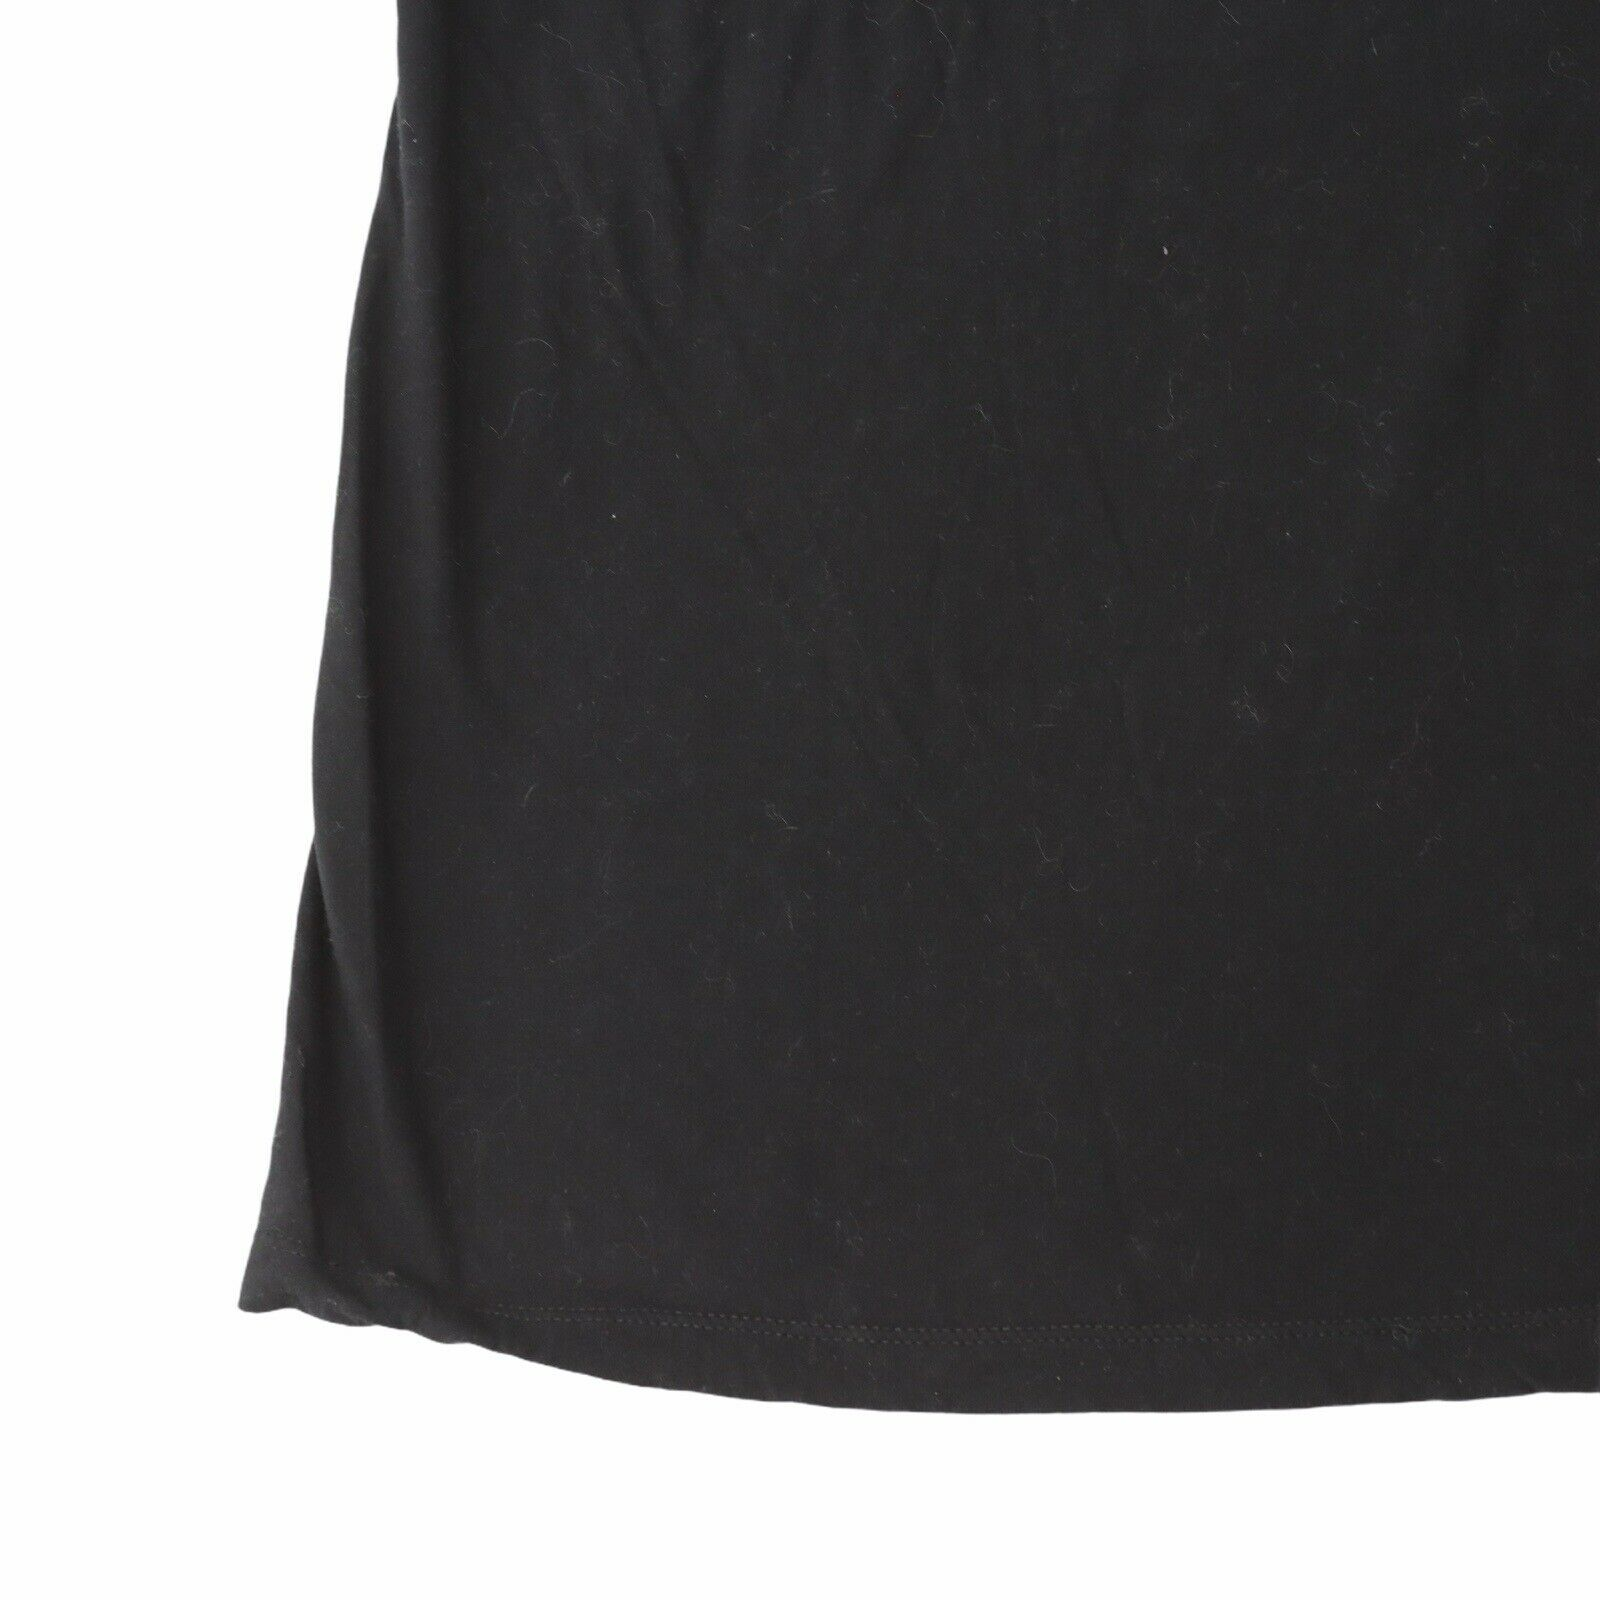 Britney Spears Shirt - It's Britney, Bitch! Rare … - image 11